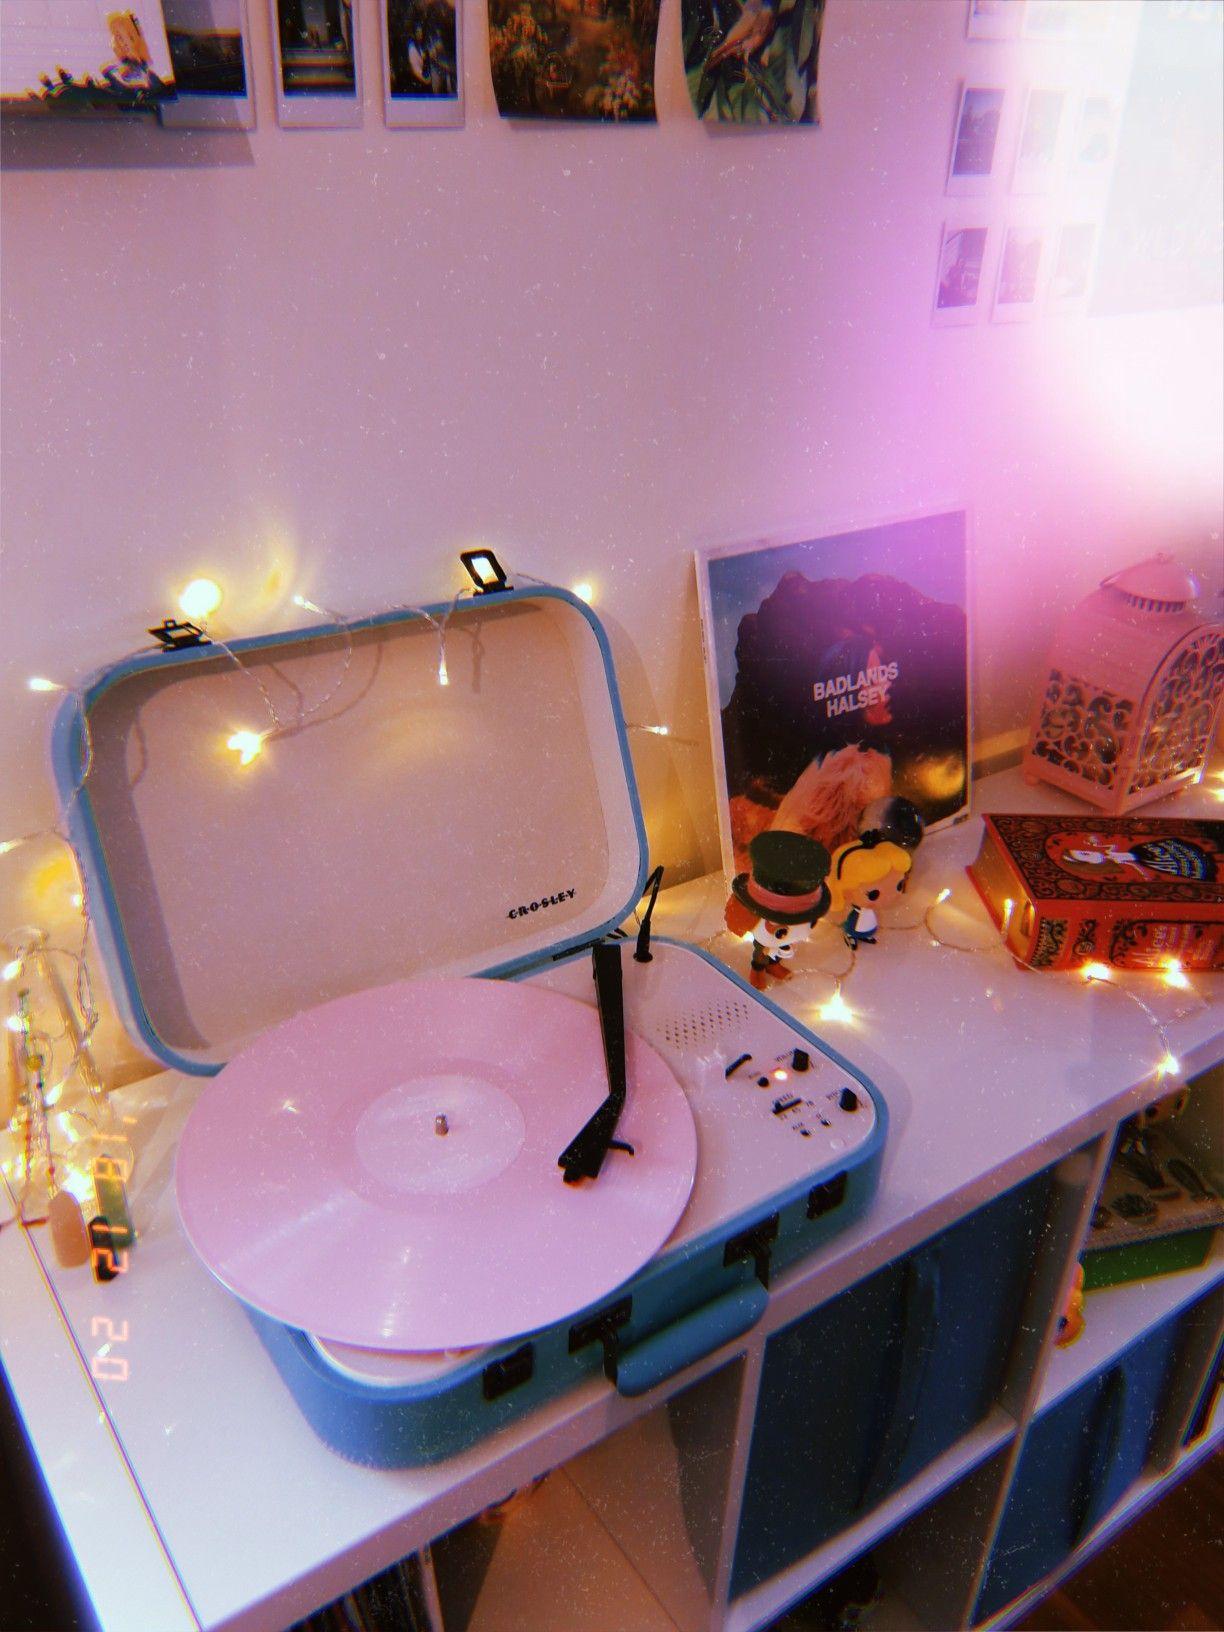 Vinyl Vinyl Aesthetic Halsey Pastel Tumblr Decoration Aesthetic Room Decor Retro Room Aesthetic Bedroom